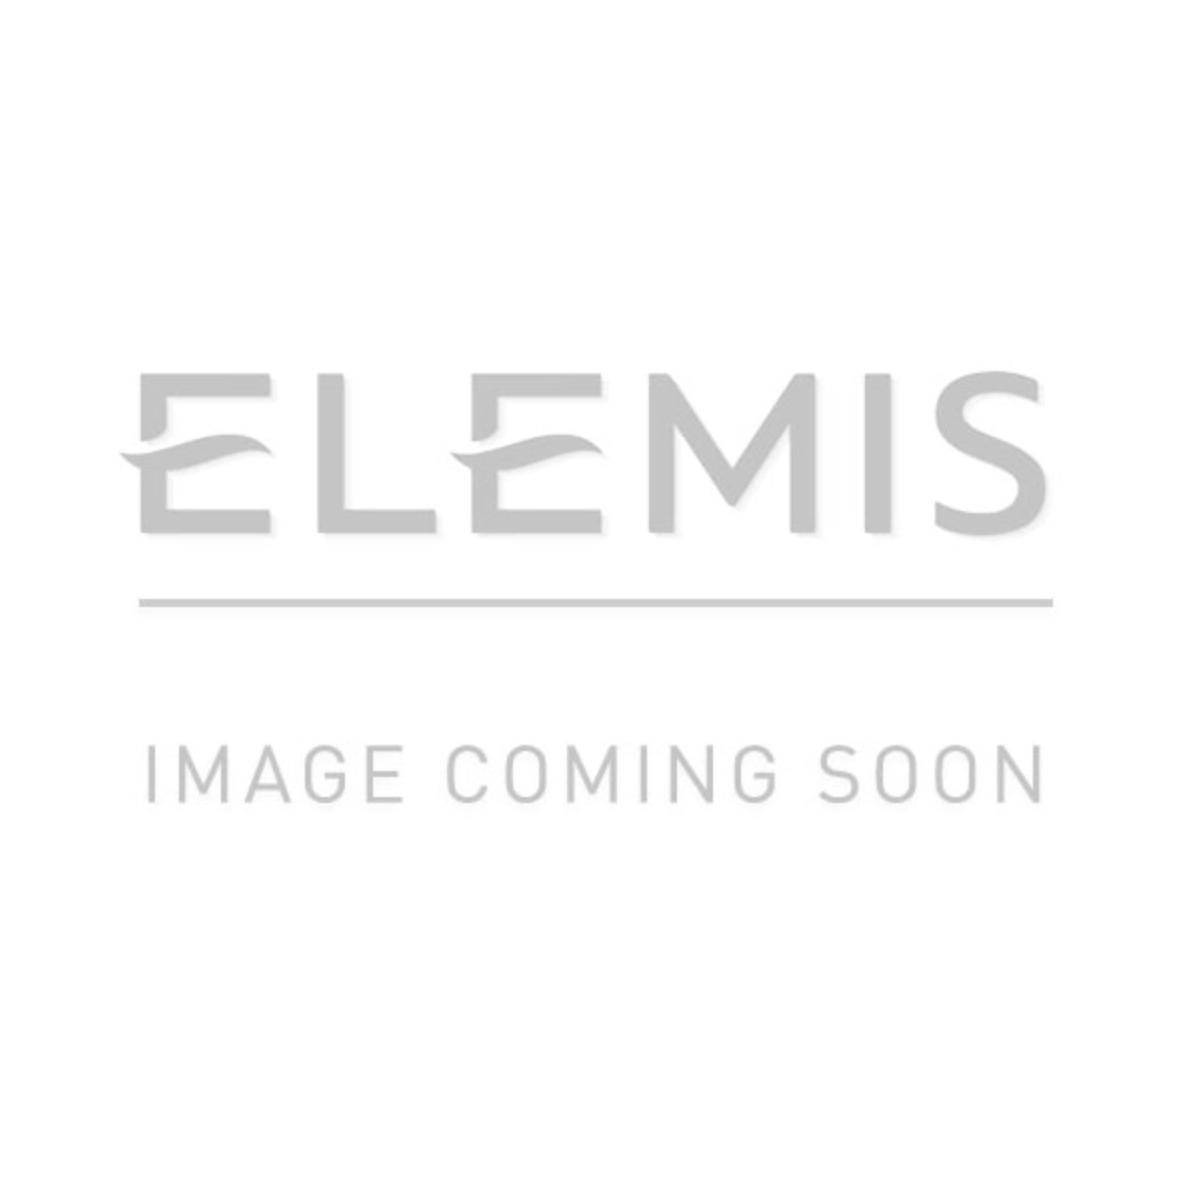 Pro-Collagen Cleanse & Moisturise